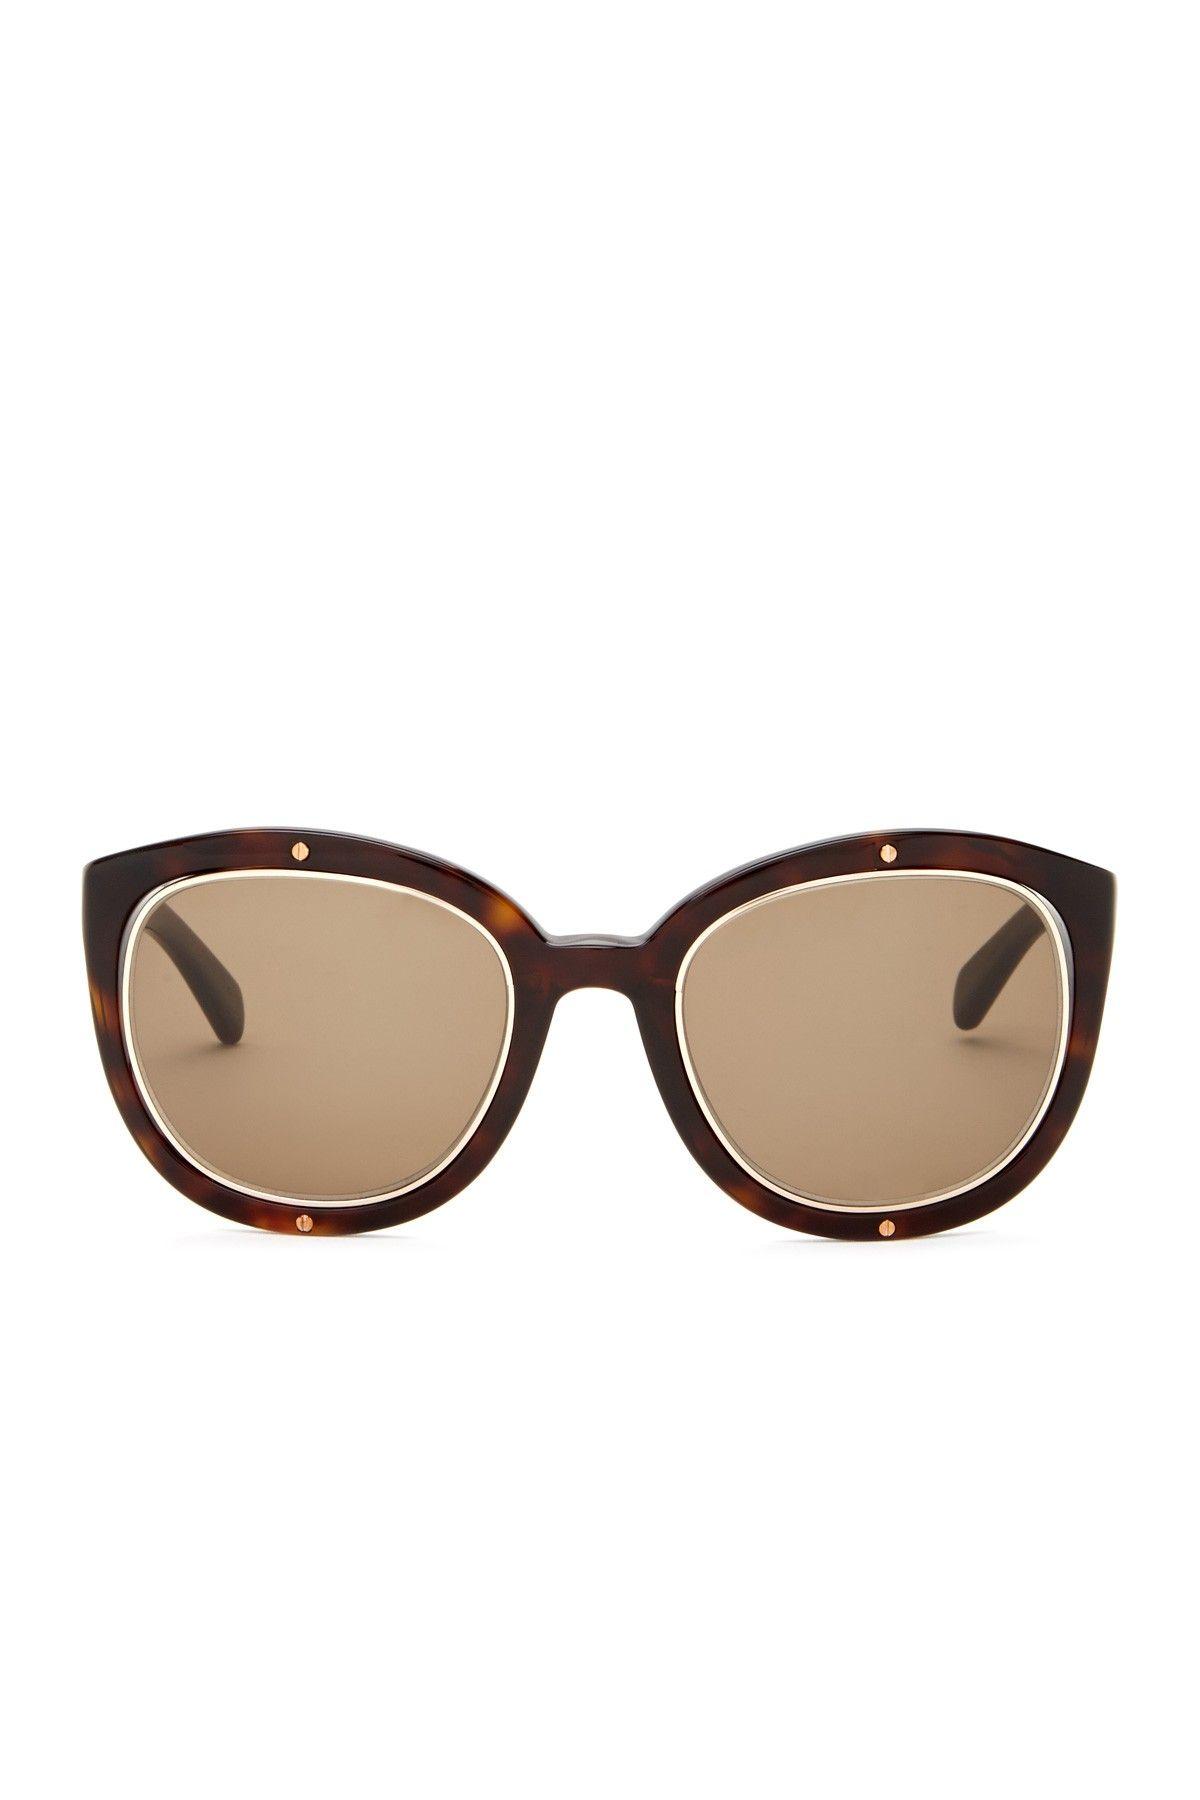 Womenus retro cat eye sunglasses accessories i love pinterest